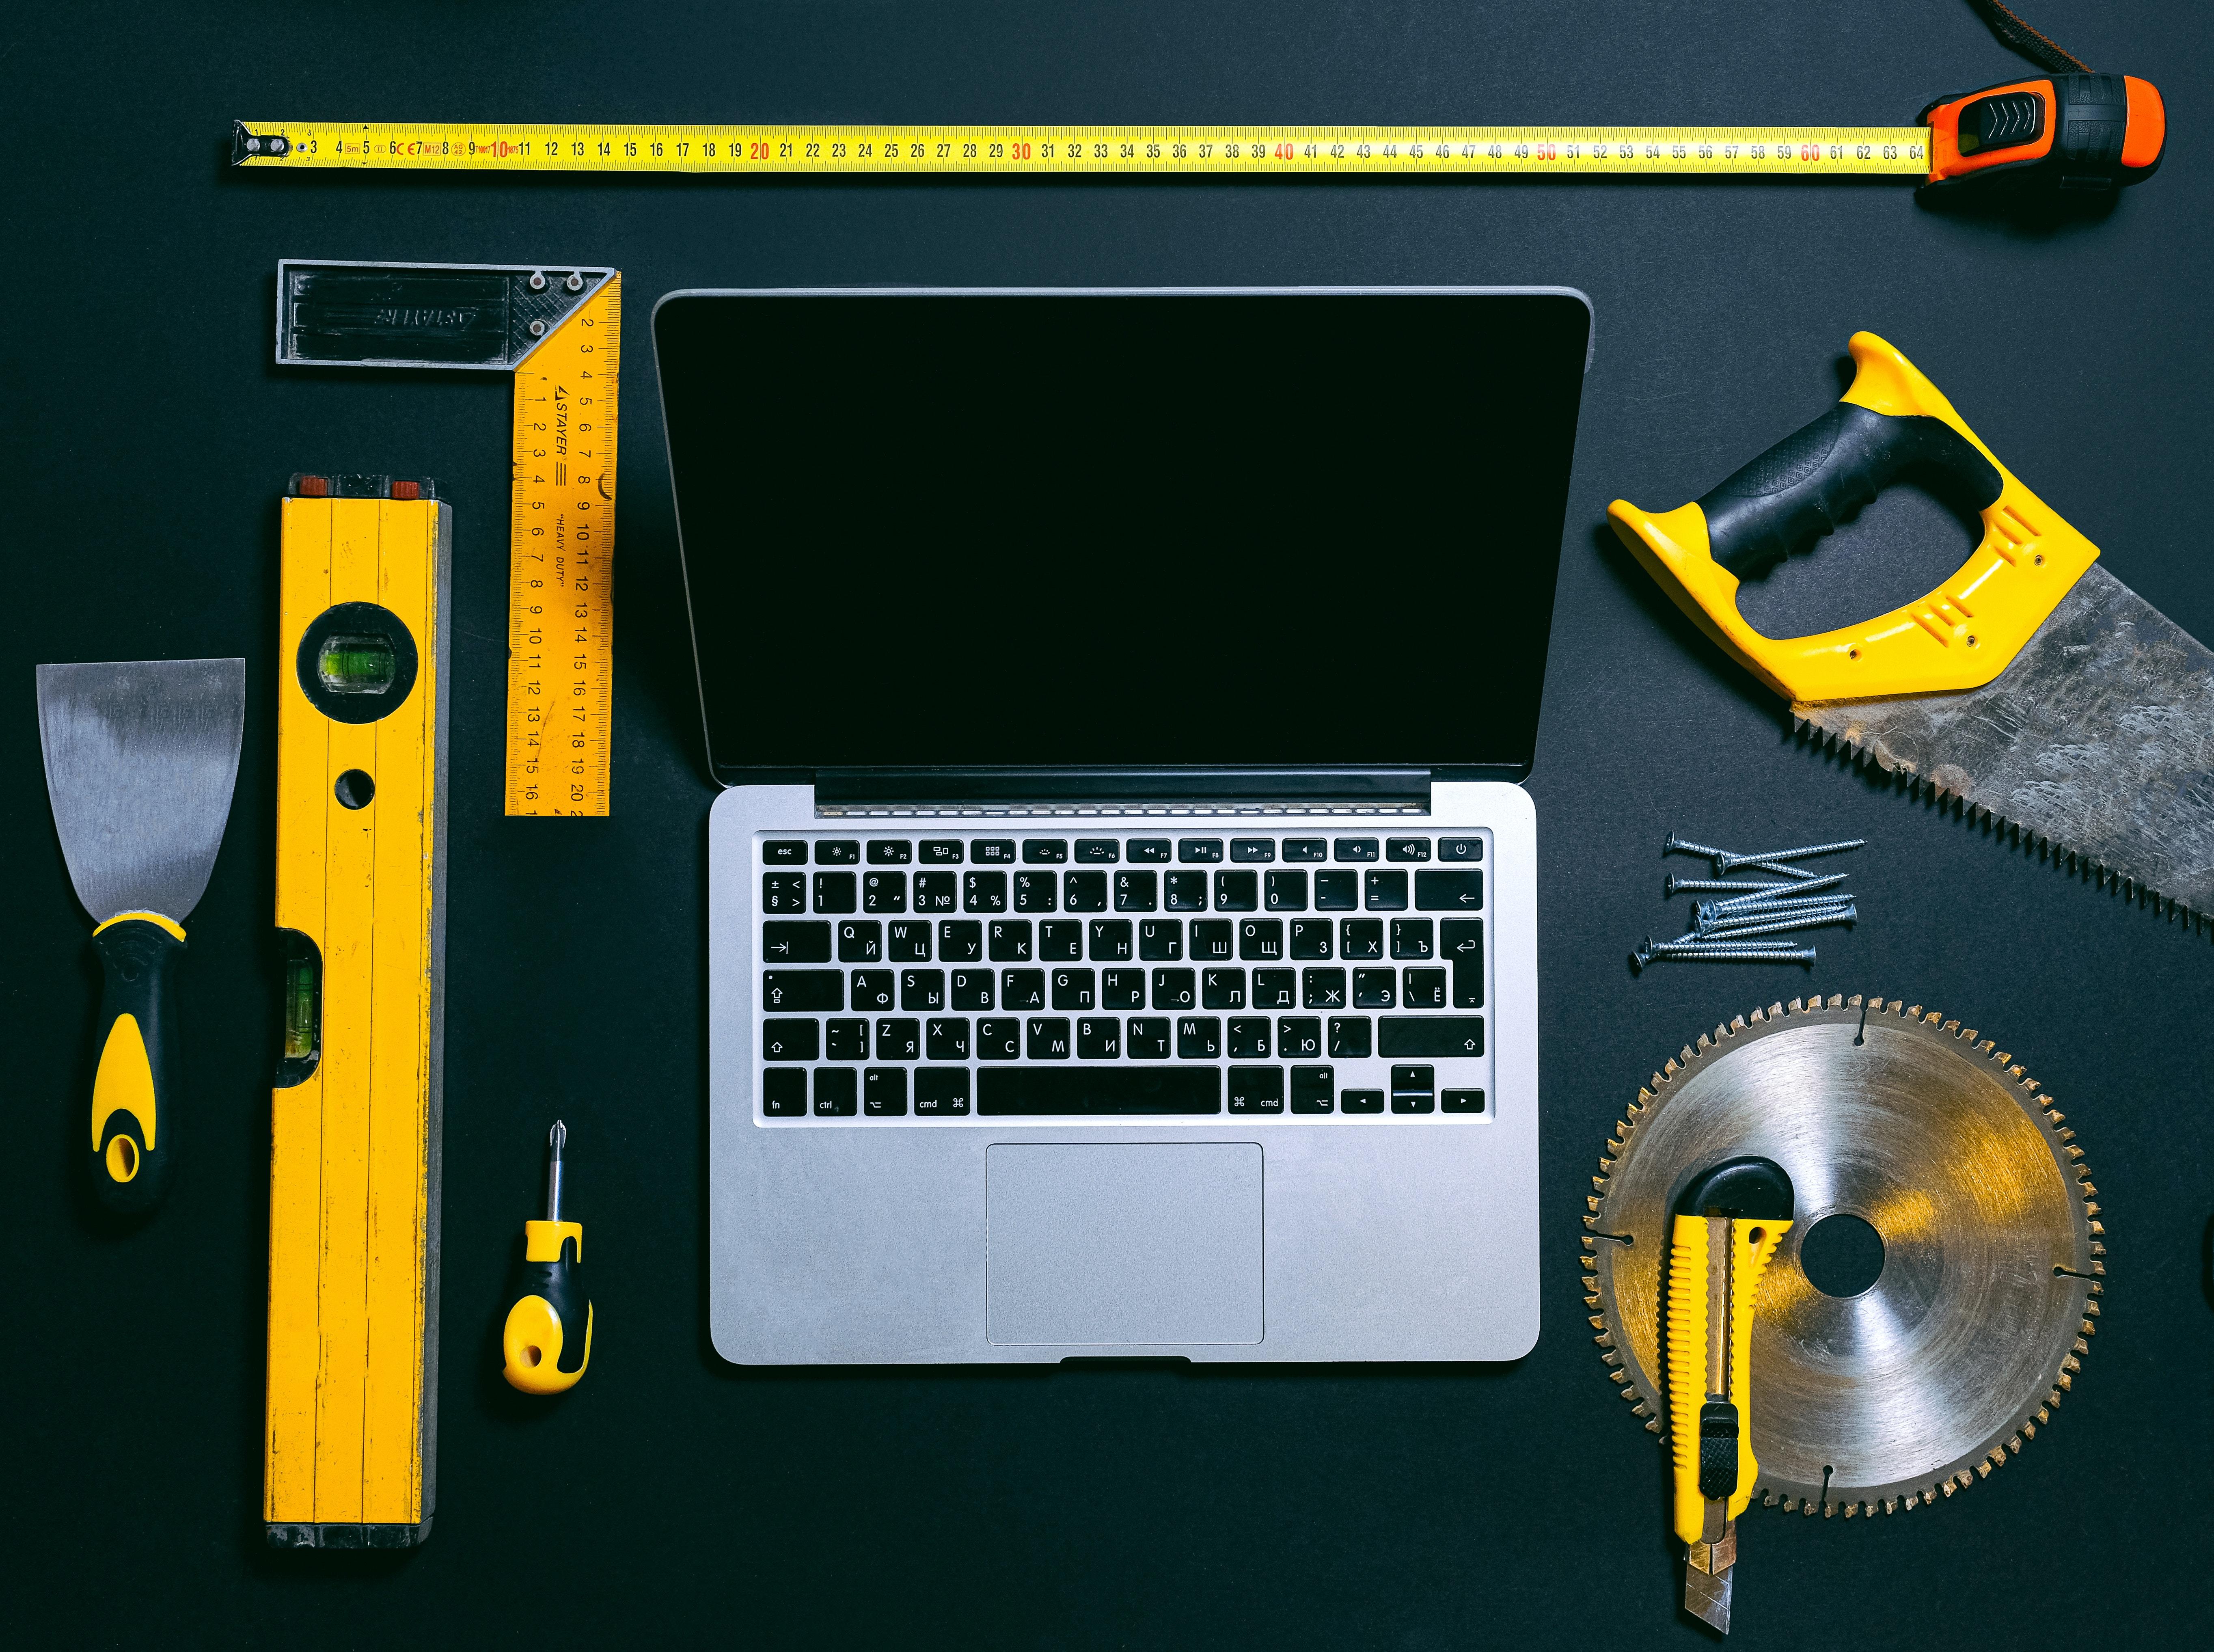 5 Ways to Encourage Tech Adoption for Your Team